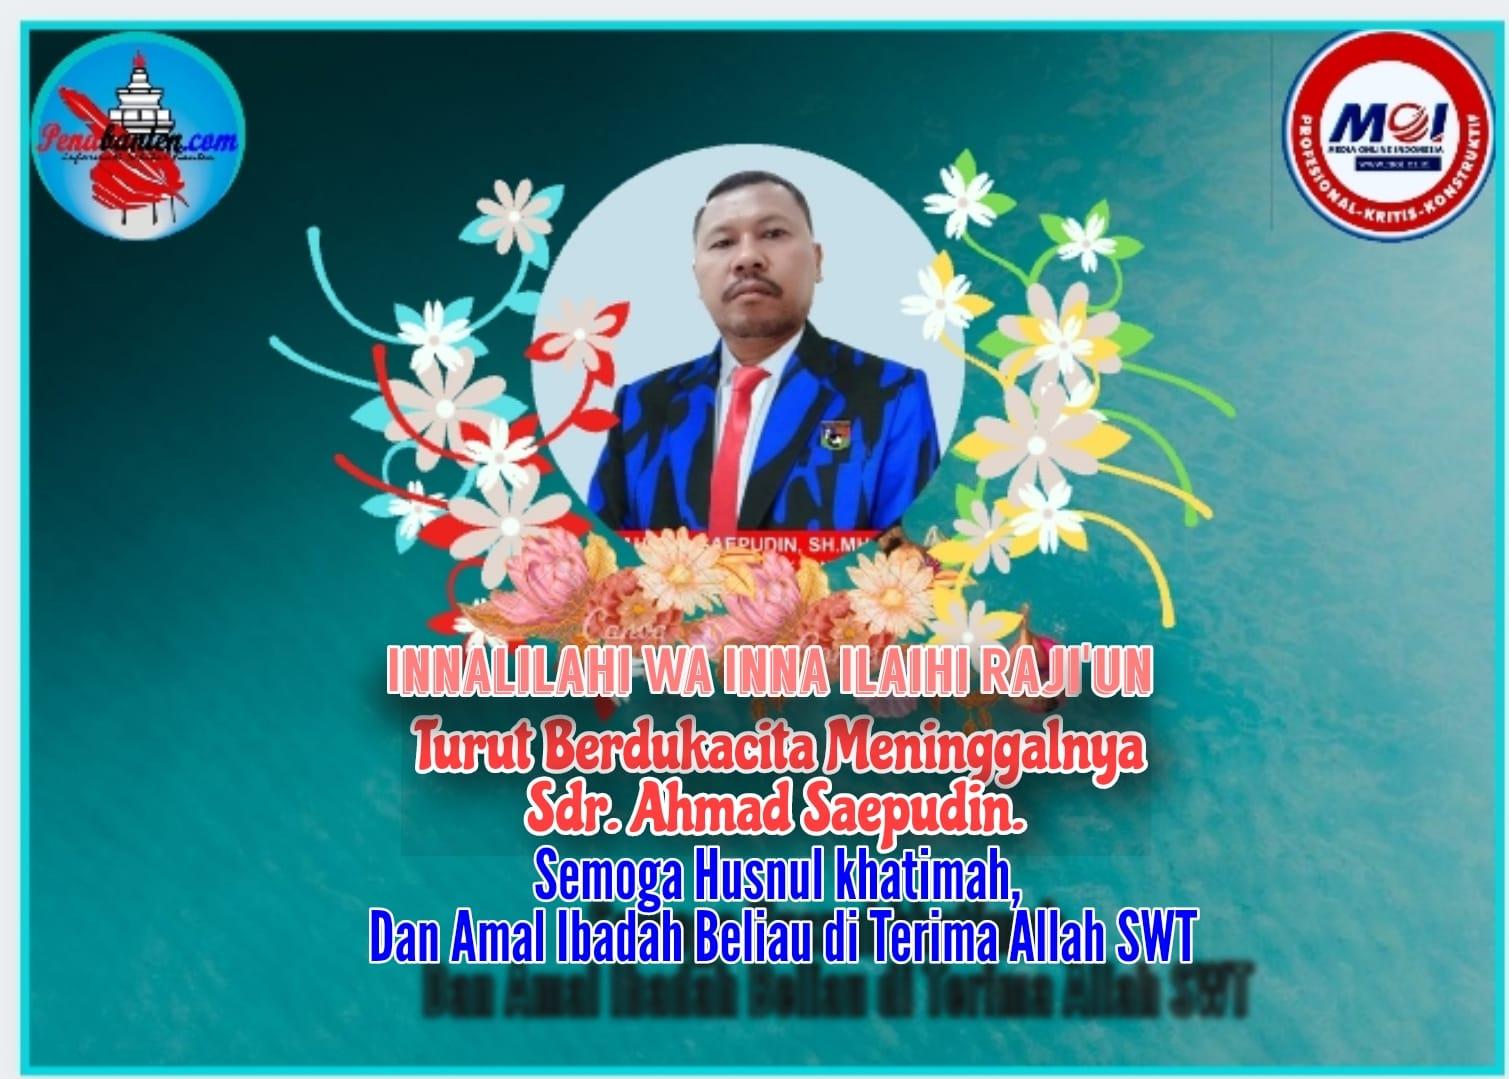 Gambar Perkumpulan Media Online Indonesia Kabupaten Tangerang Berduka 7